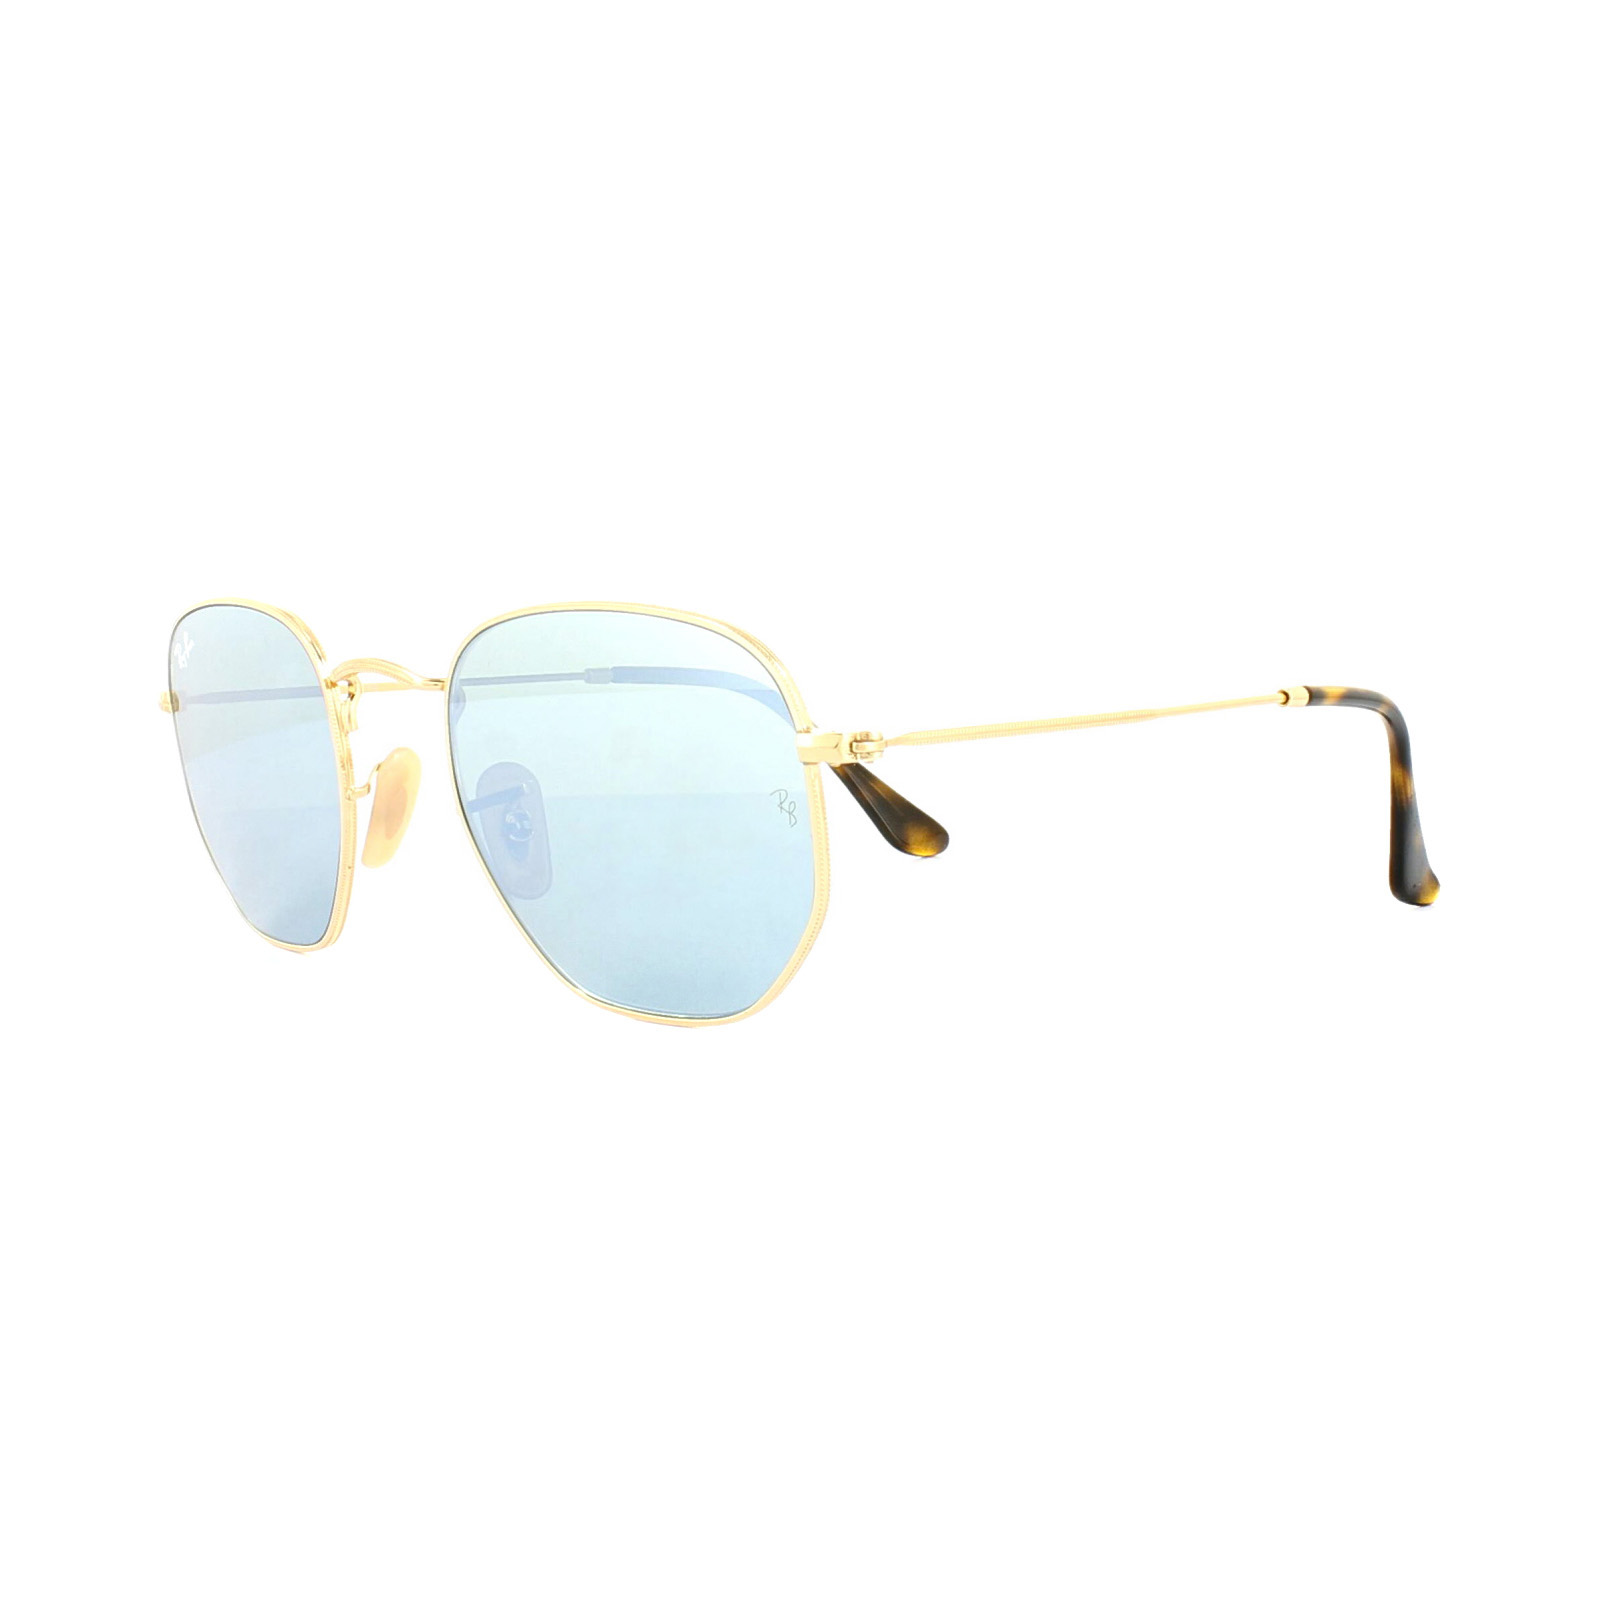 Ray ban gafas de sol hexagonal 3548n 001 30 oro plata espejo for Gafas de sol ray ban espejo